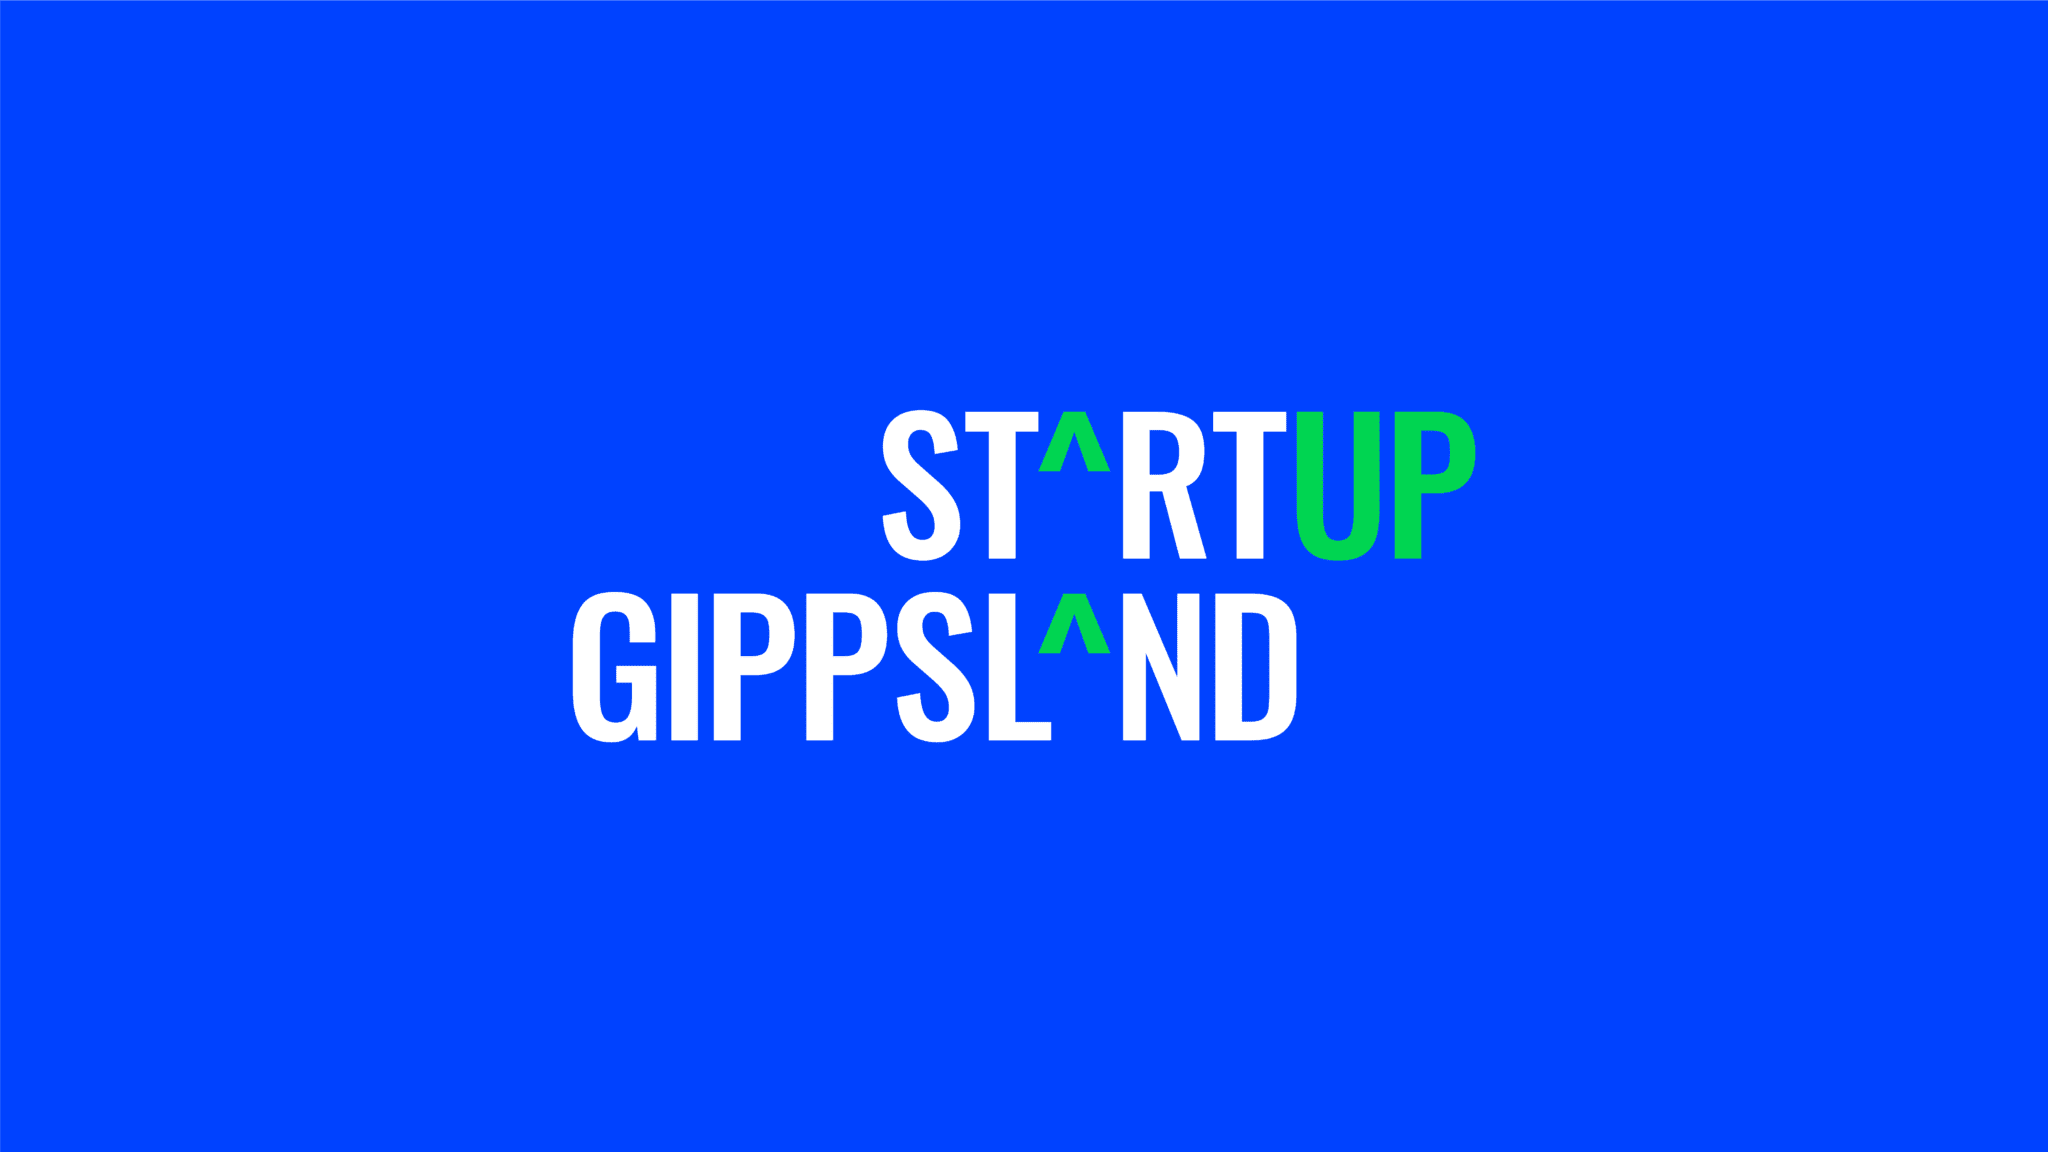 Gippsland Startup Program regional startup program business accelerator program run by GippsTech Warragul